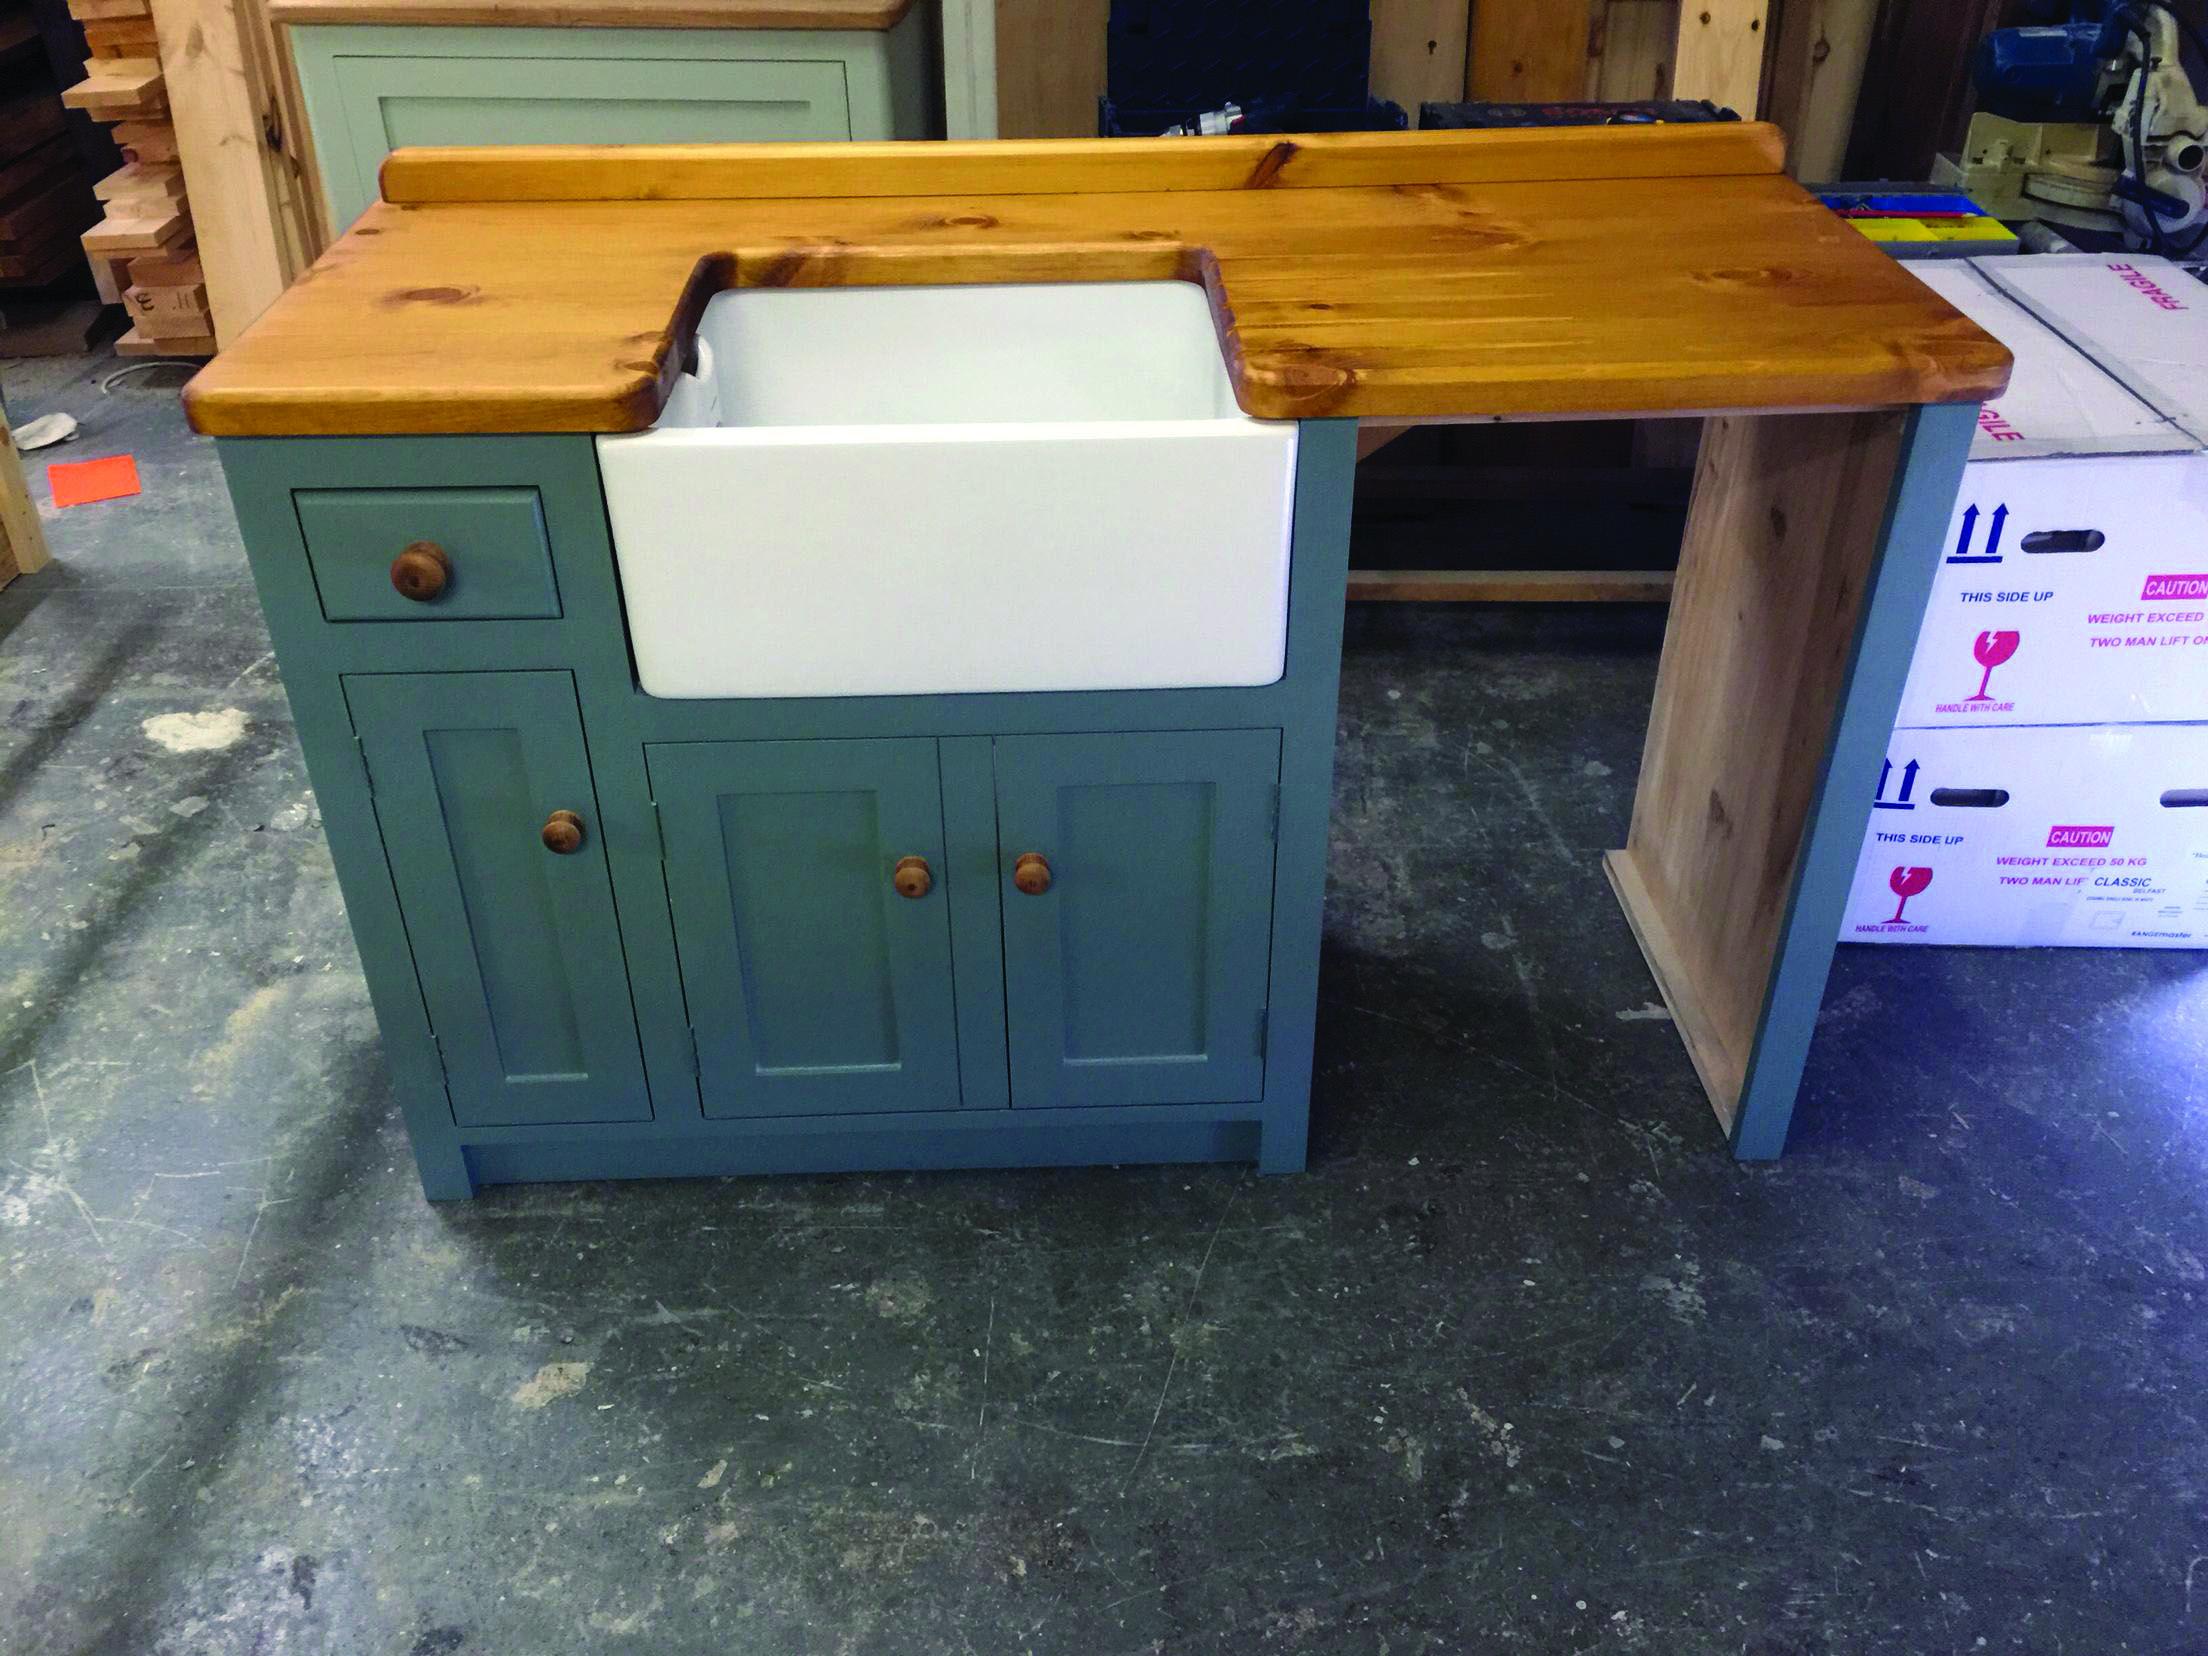 16 Flexible Freestanding Kitchen Area Suggestions Kitchen Sink Units Kitchen Island With Sink Butler Sink